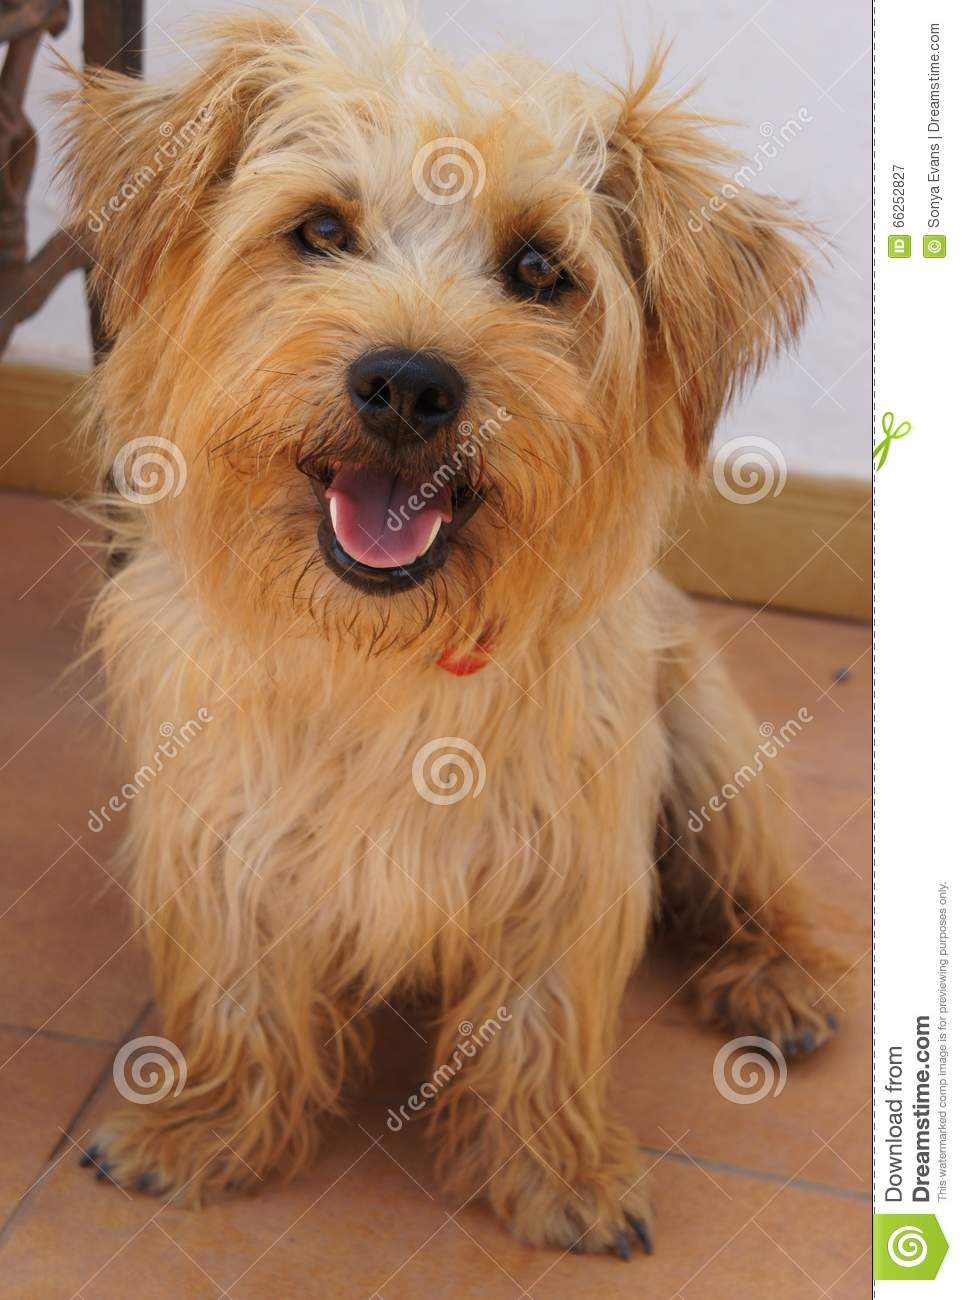 Glen Of Imaal Terrier Mixed Breed Dog Stock Photo.